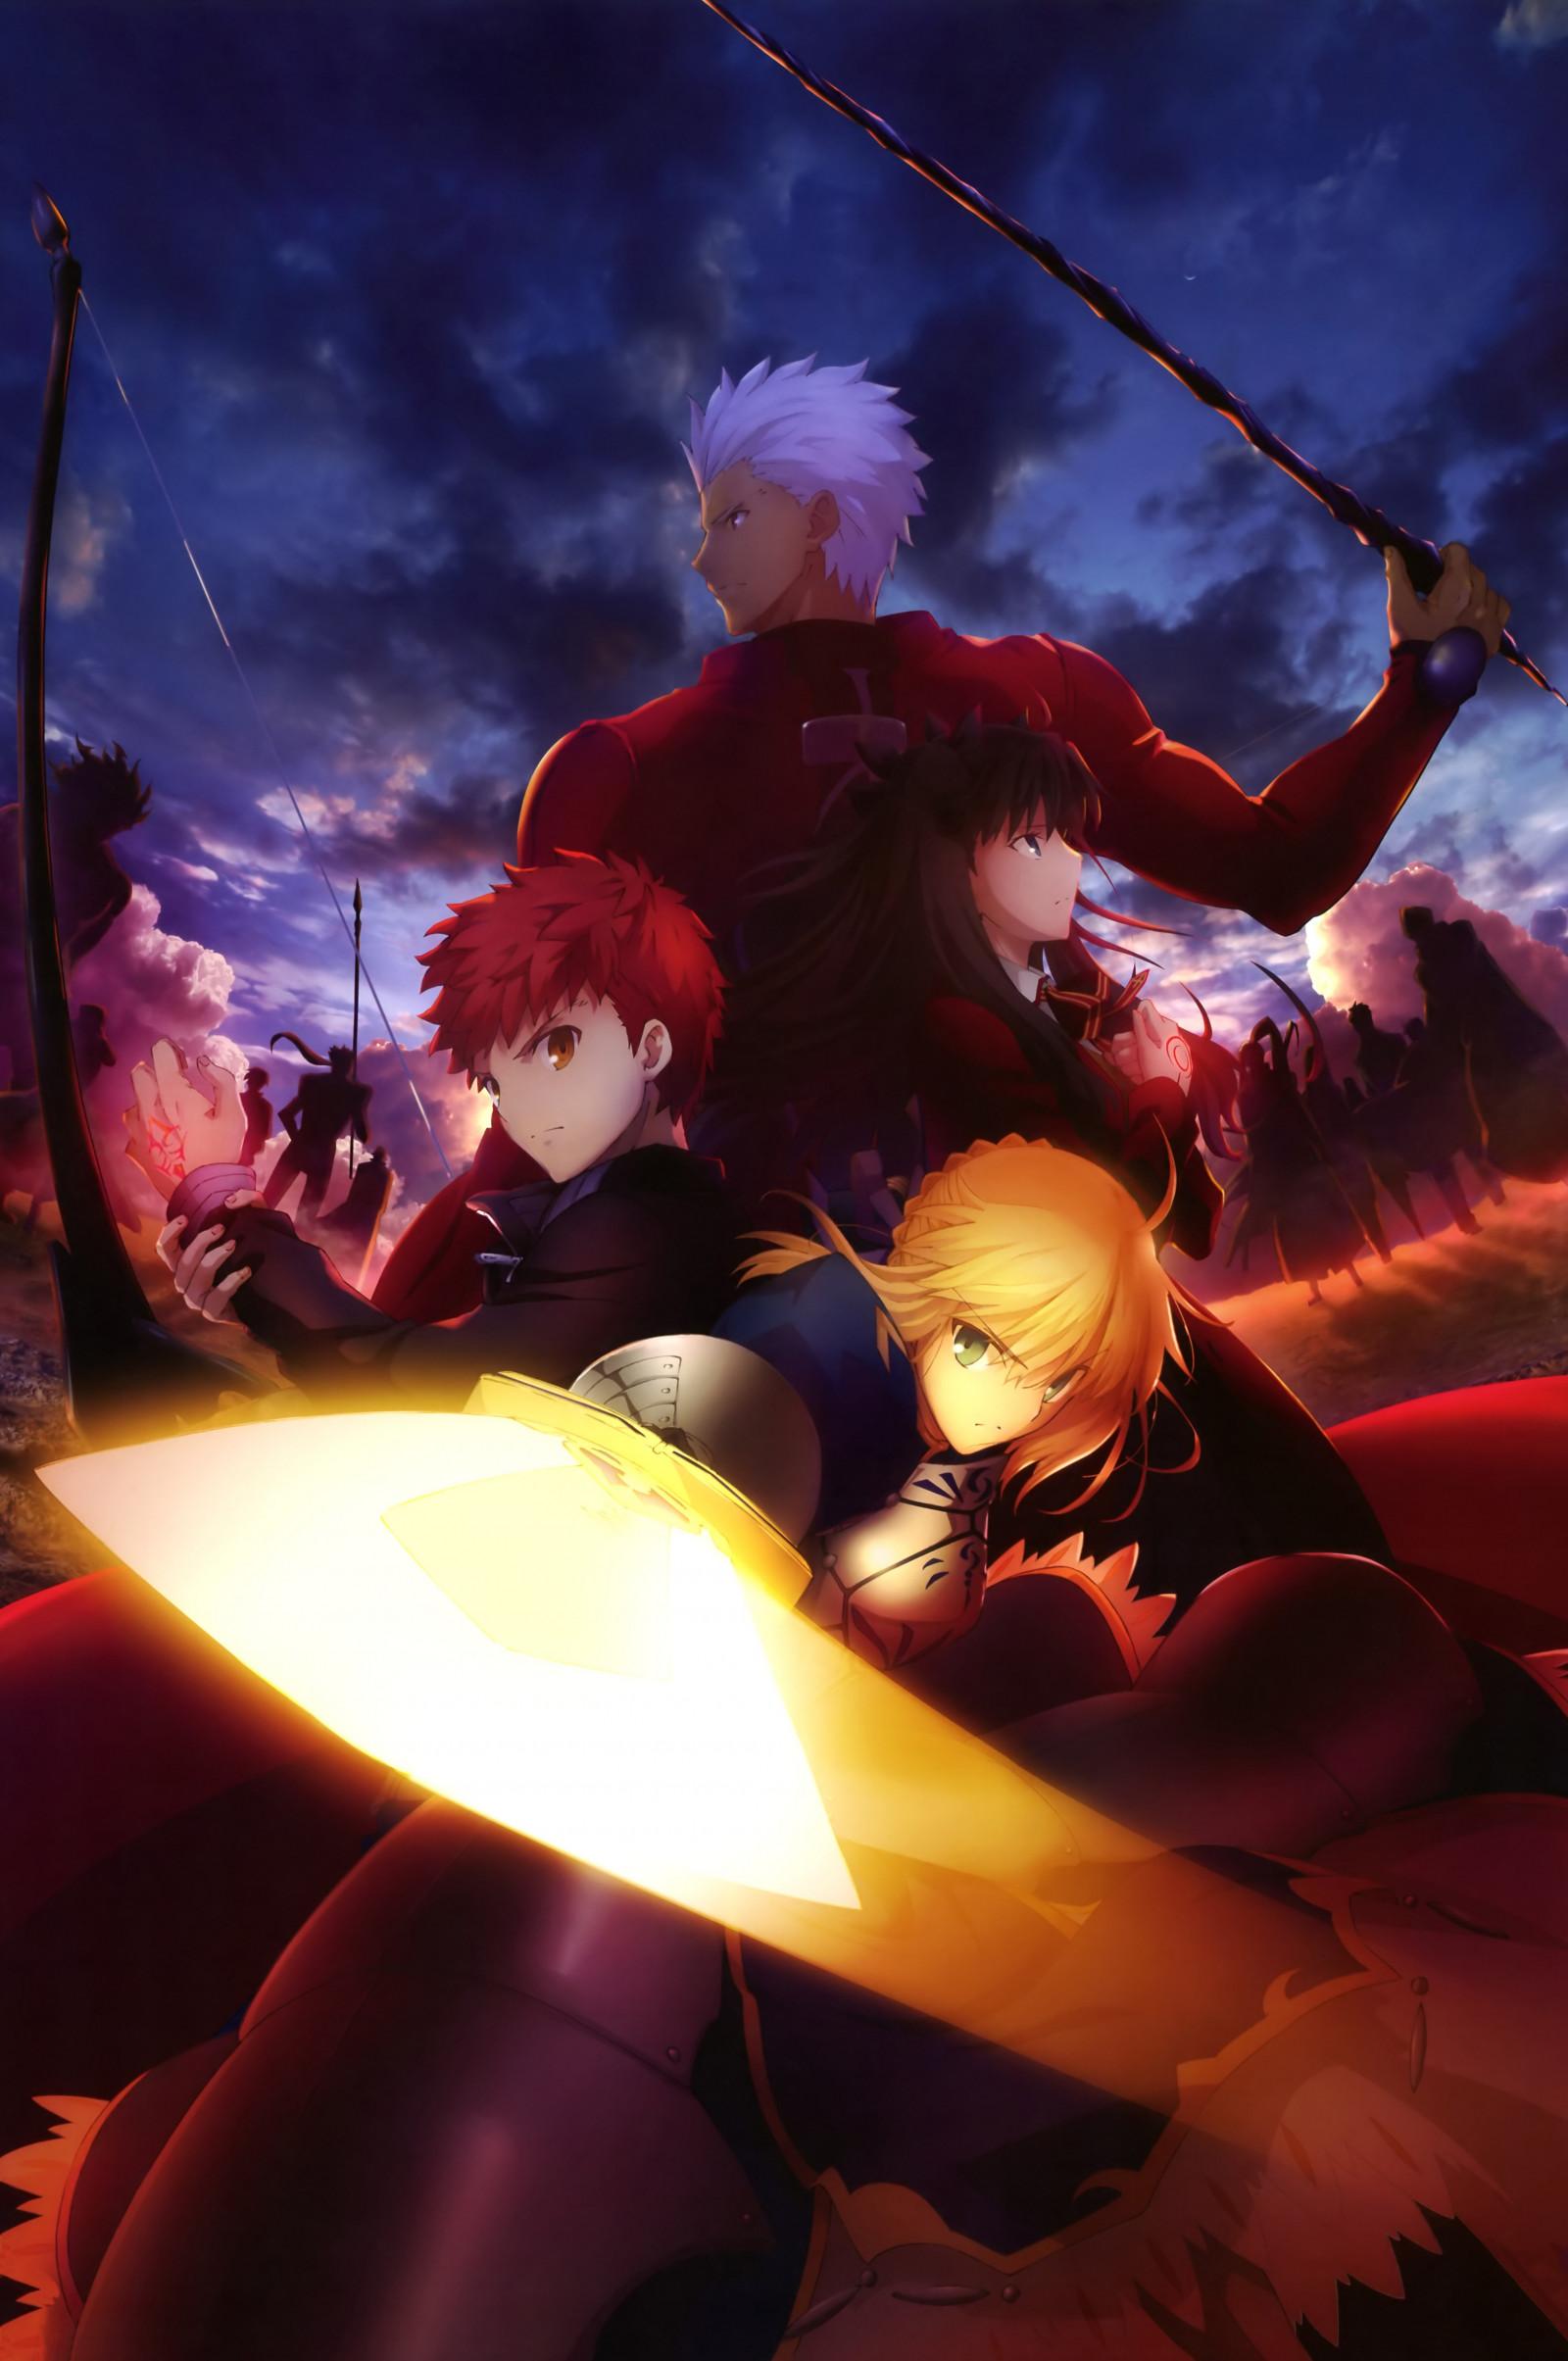 Wallpaper : illustration. anime. Fate Stay Night. Saber. Fate Series. Tohsaka Rin. Shirou Emiya. screenshot. computer wallpaper. fictional ...